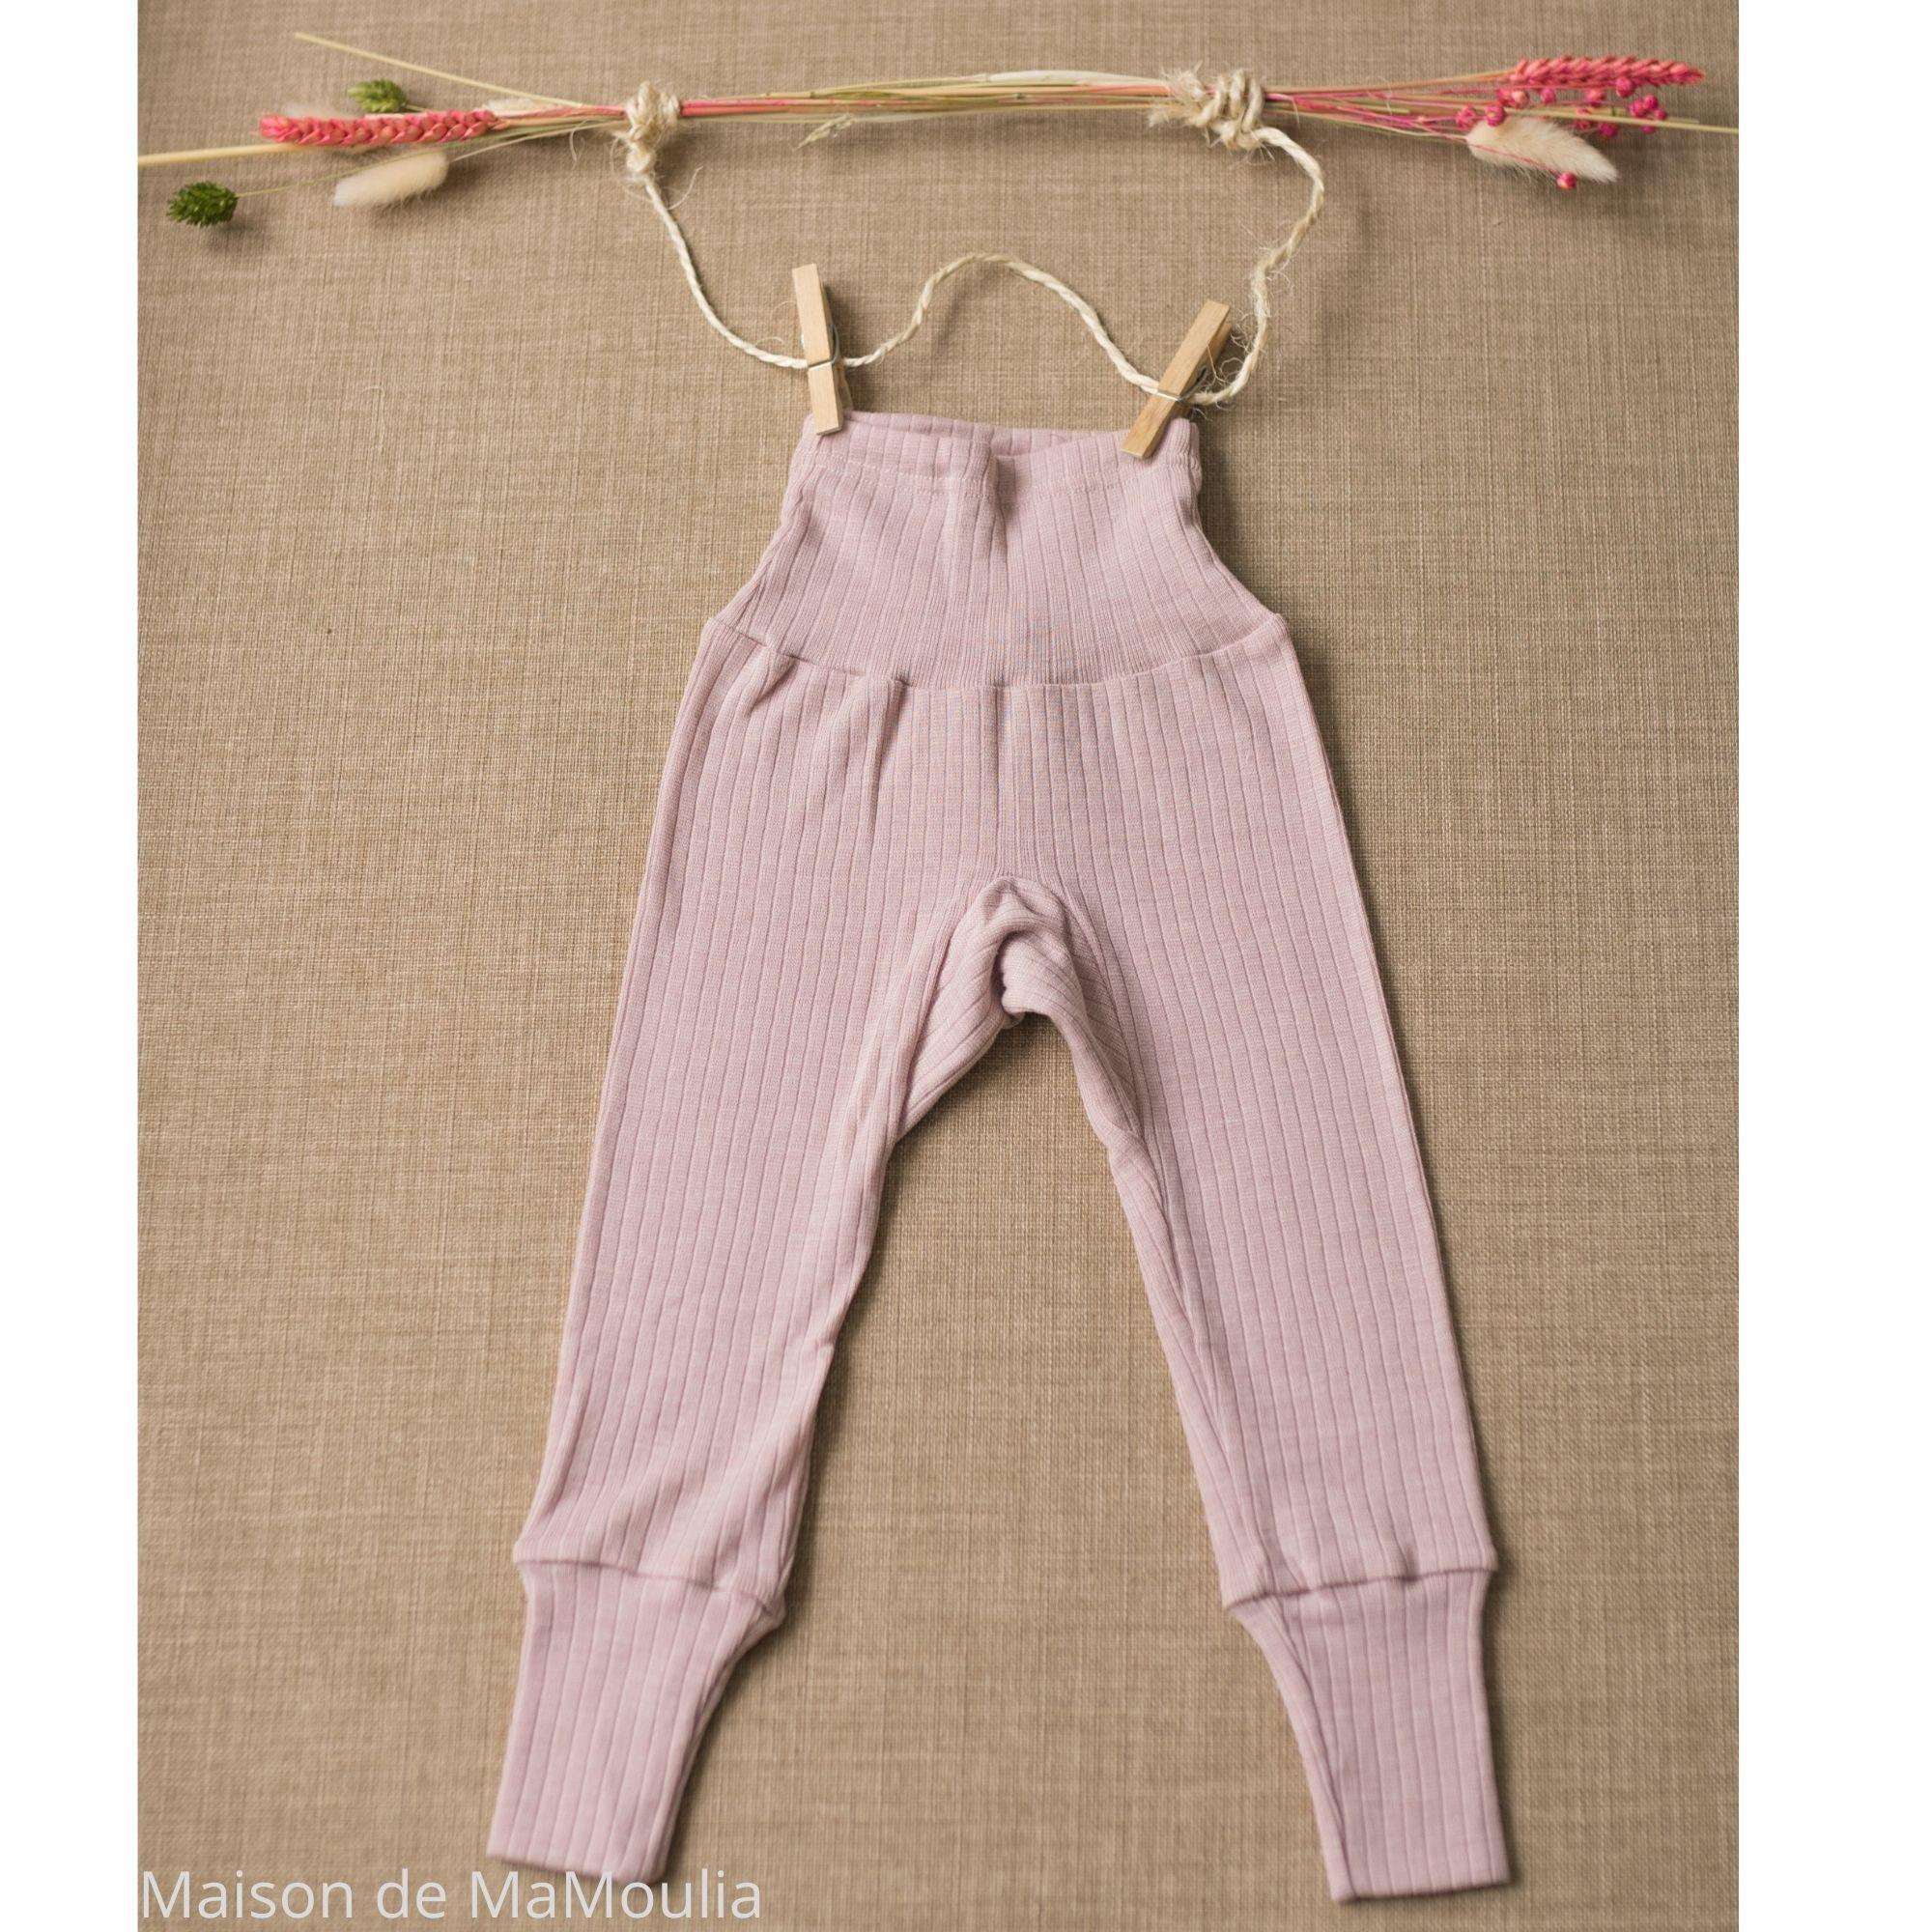 COSILANA - Pantalon ceinture large - Laine/Soie/Coton bio, Rose